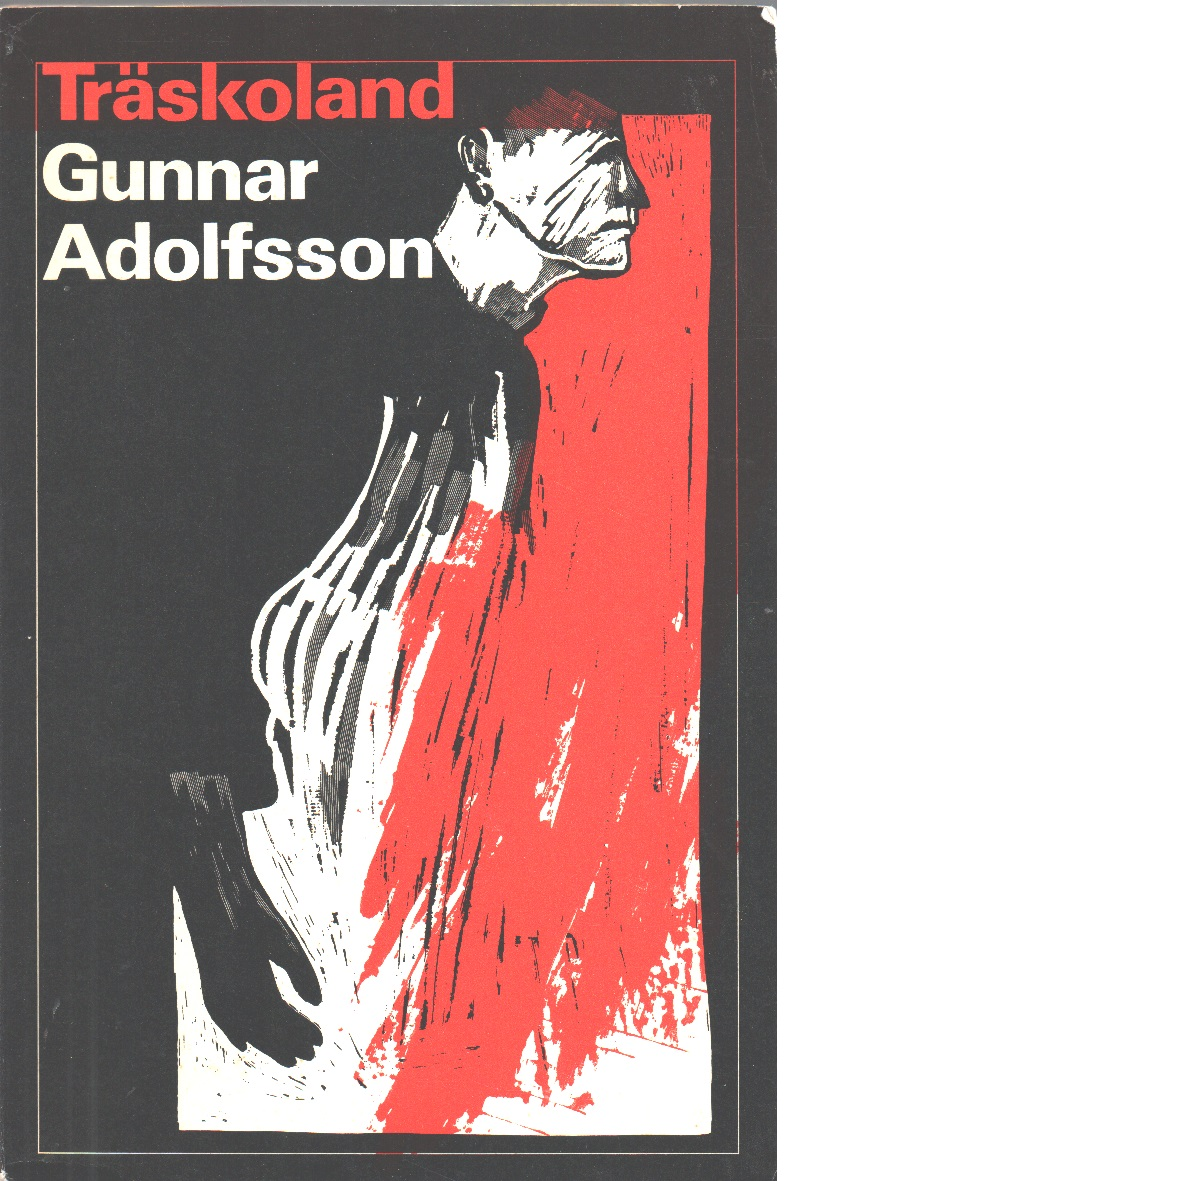 Träskoland - Adolfsson, Gunnar